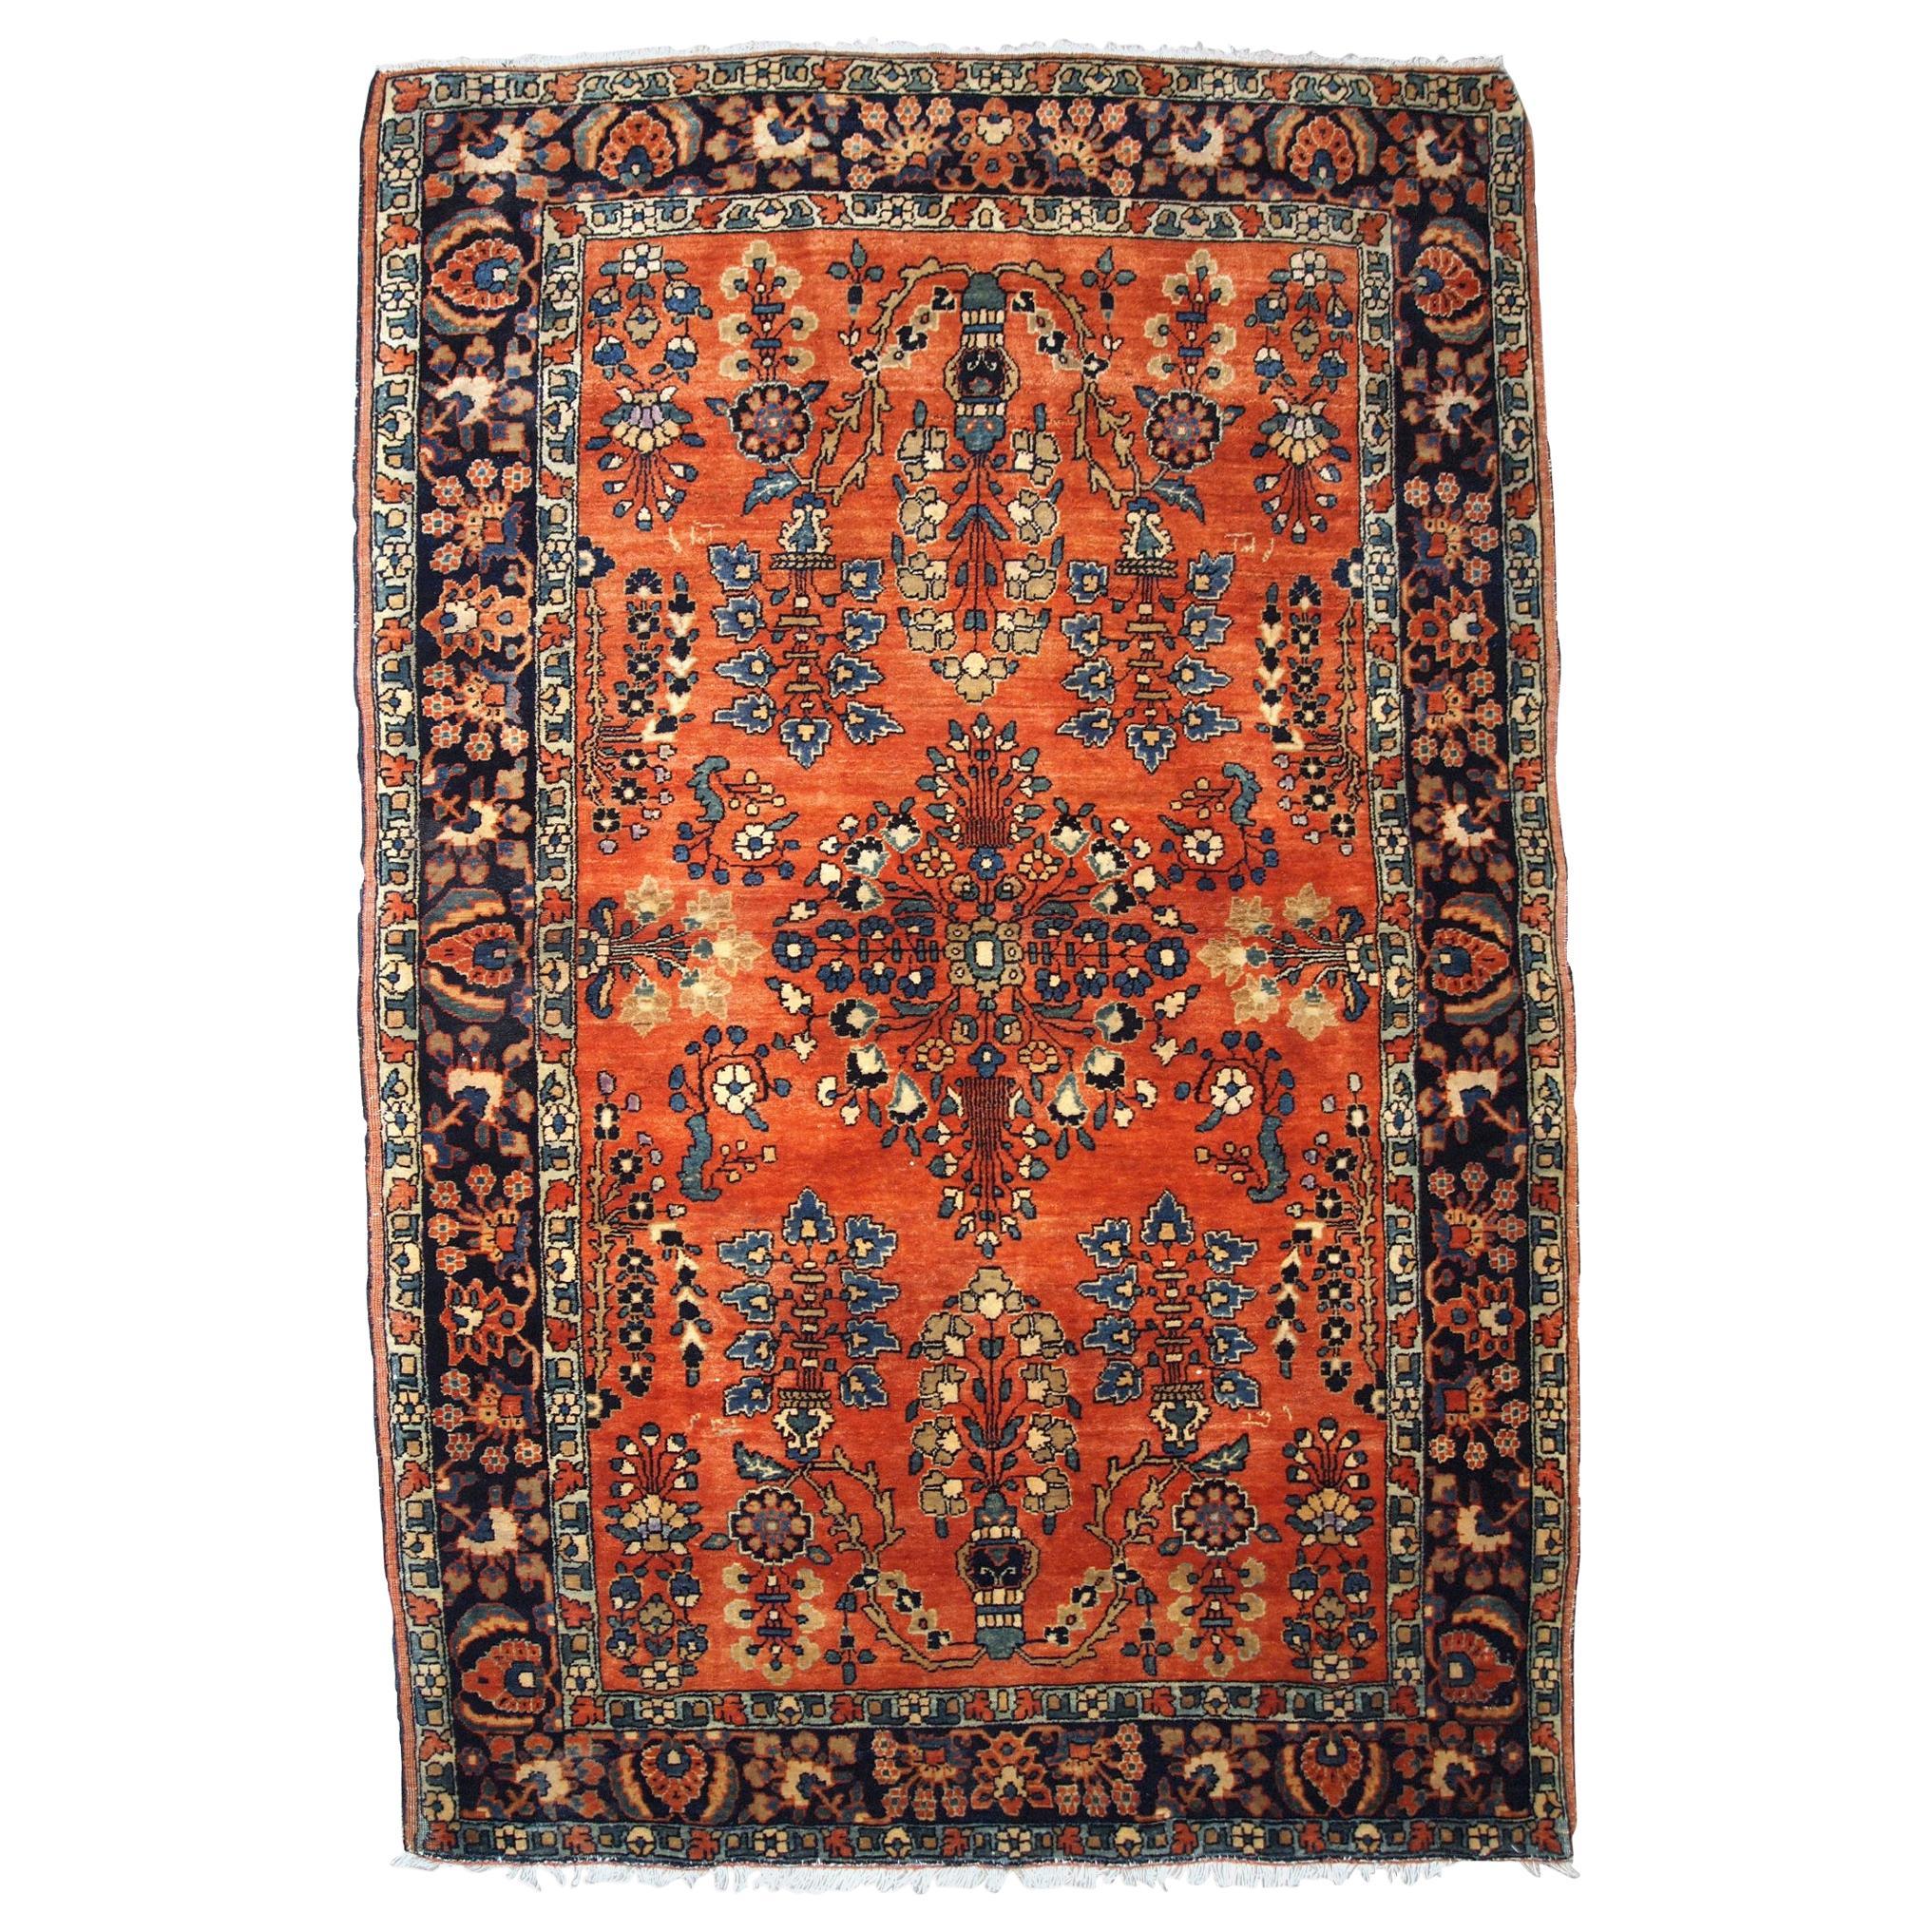 Handmade Antique Sarouk Style Rug, 1900s, 1B824